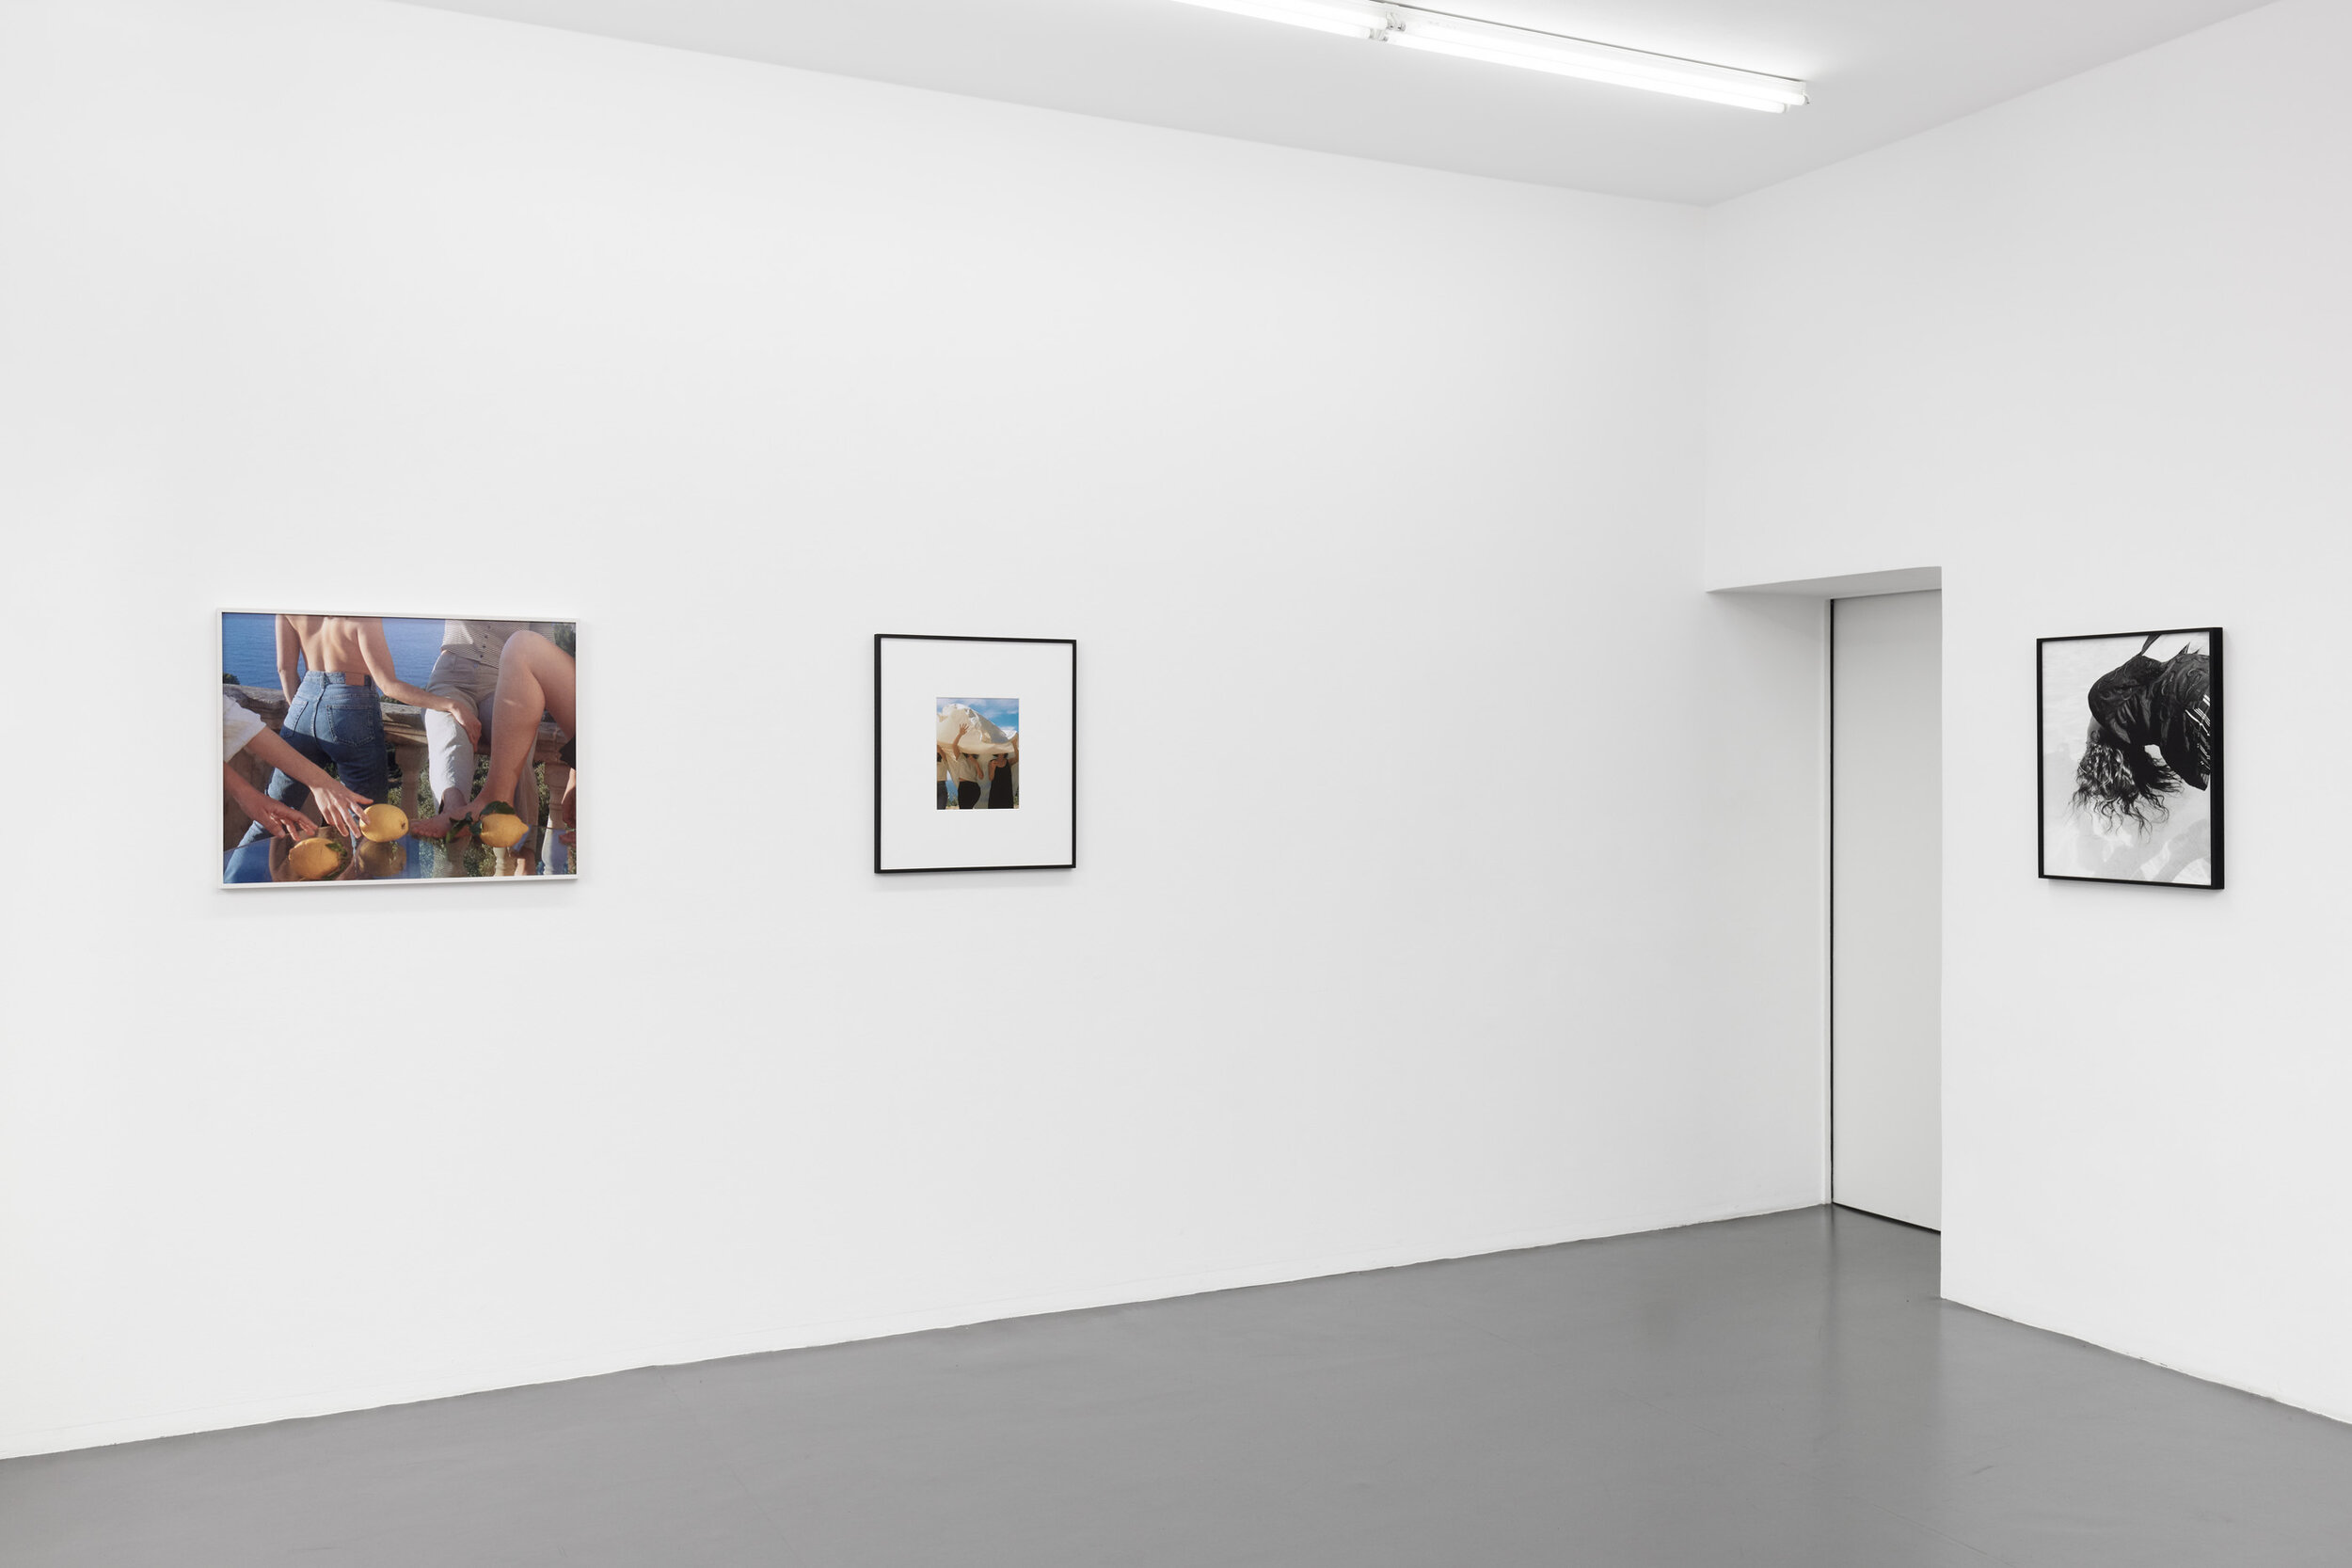 Installation view, Schwarz Contemporary, 2019  Photo: def image, Courtesy: SCHWARZ CONTEMPORARY